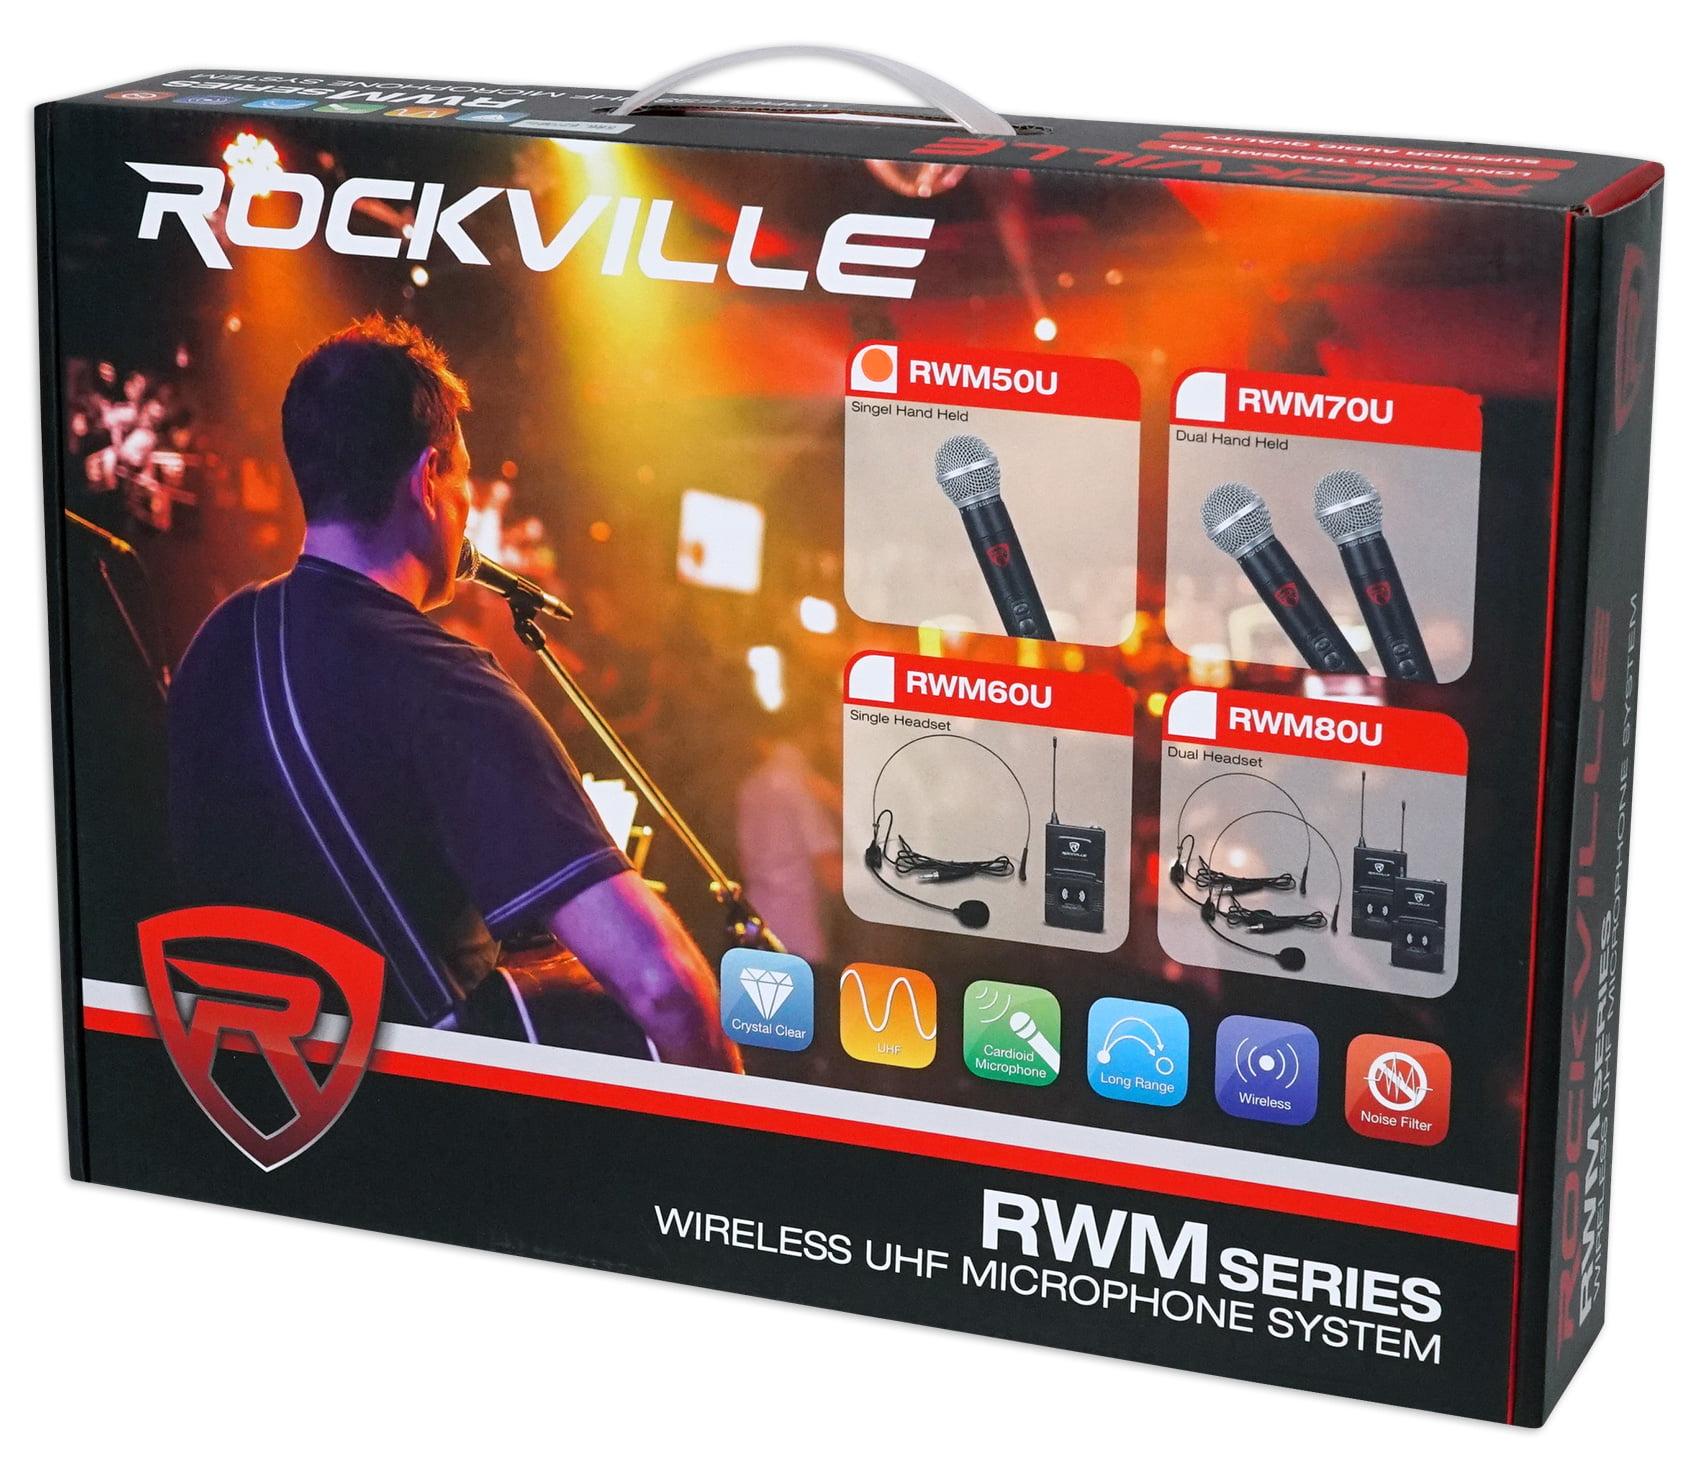 Rockville RWM50U Professional Single UHF Handheld Wireless Microphone System